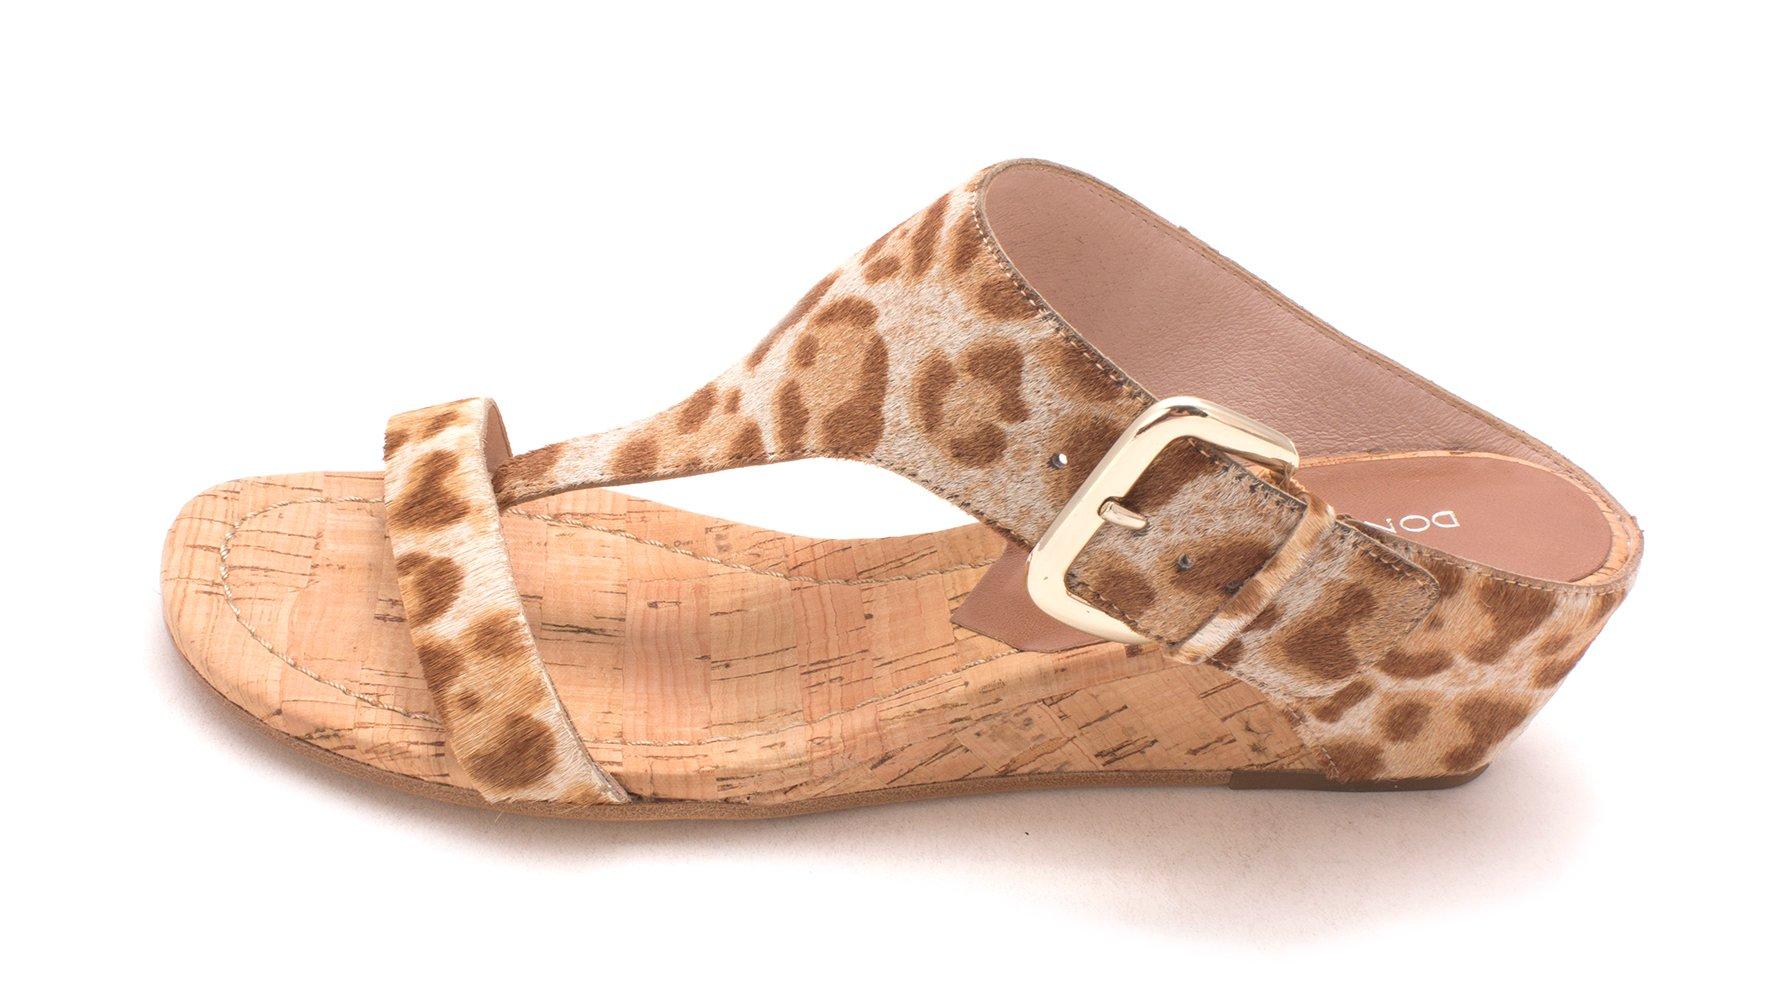 Donald J Pliner Womens LI4-SG Leather Open Toe Casual T-Strap Sandals, Tan/Sand Summer Leopard, 7.0